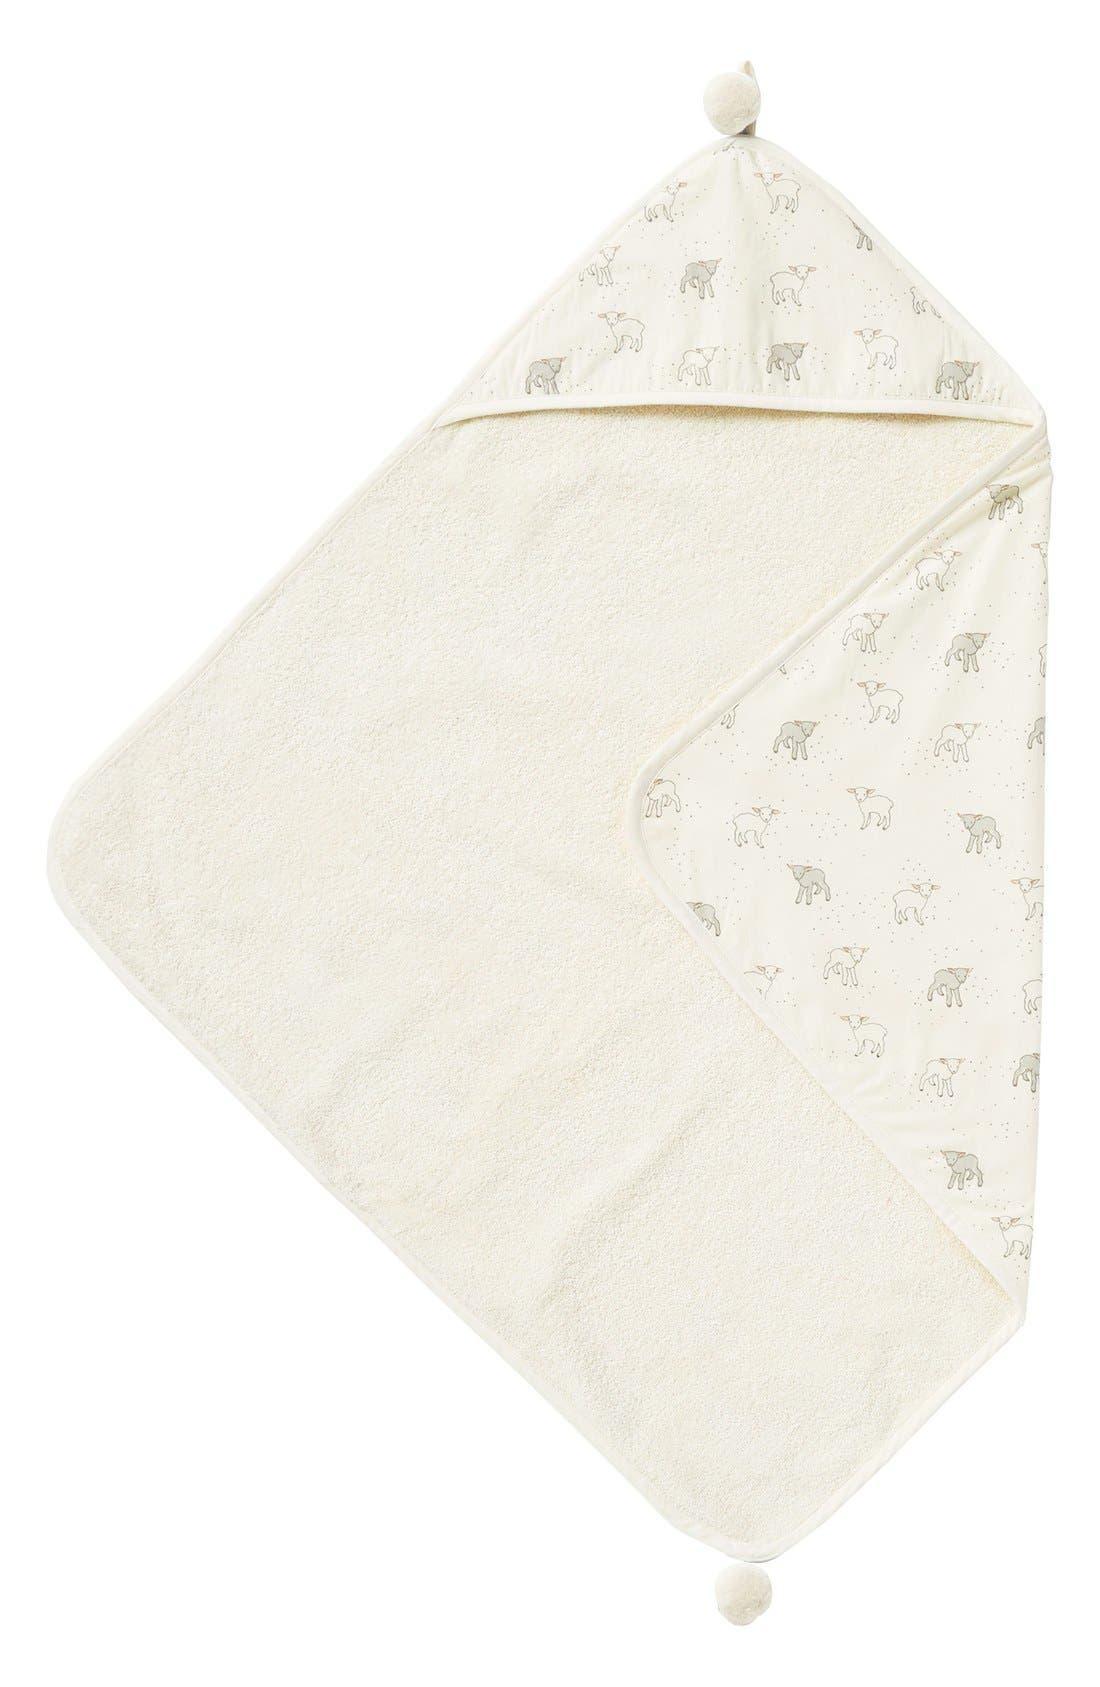 Petit Pehr 'Little Lamb' Print Hooded Towel (Baby)